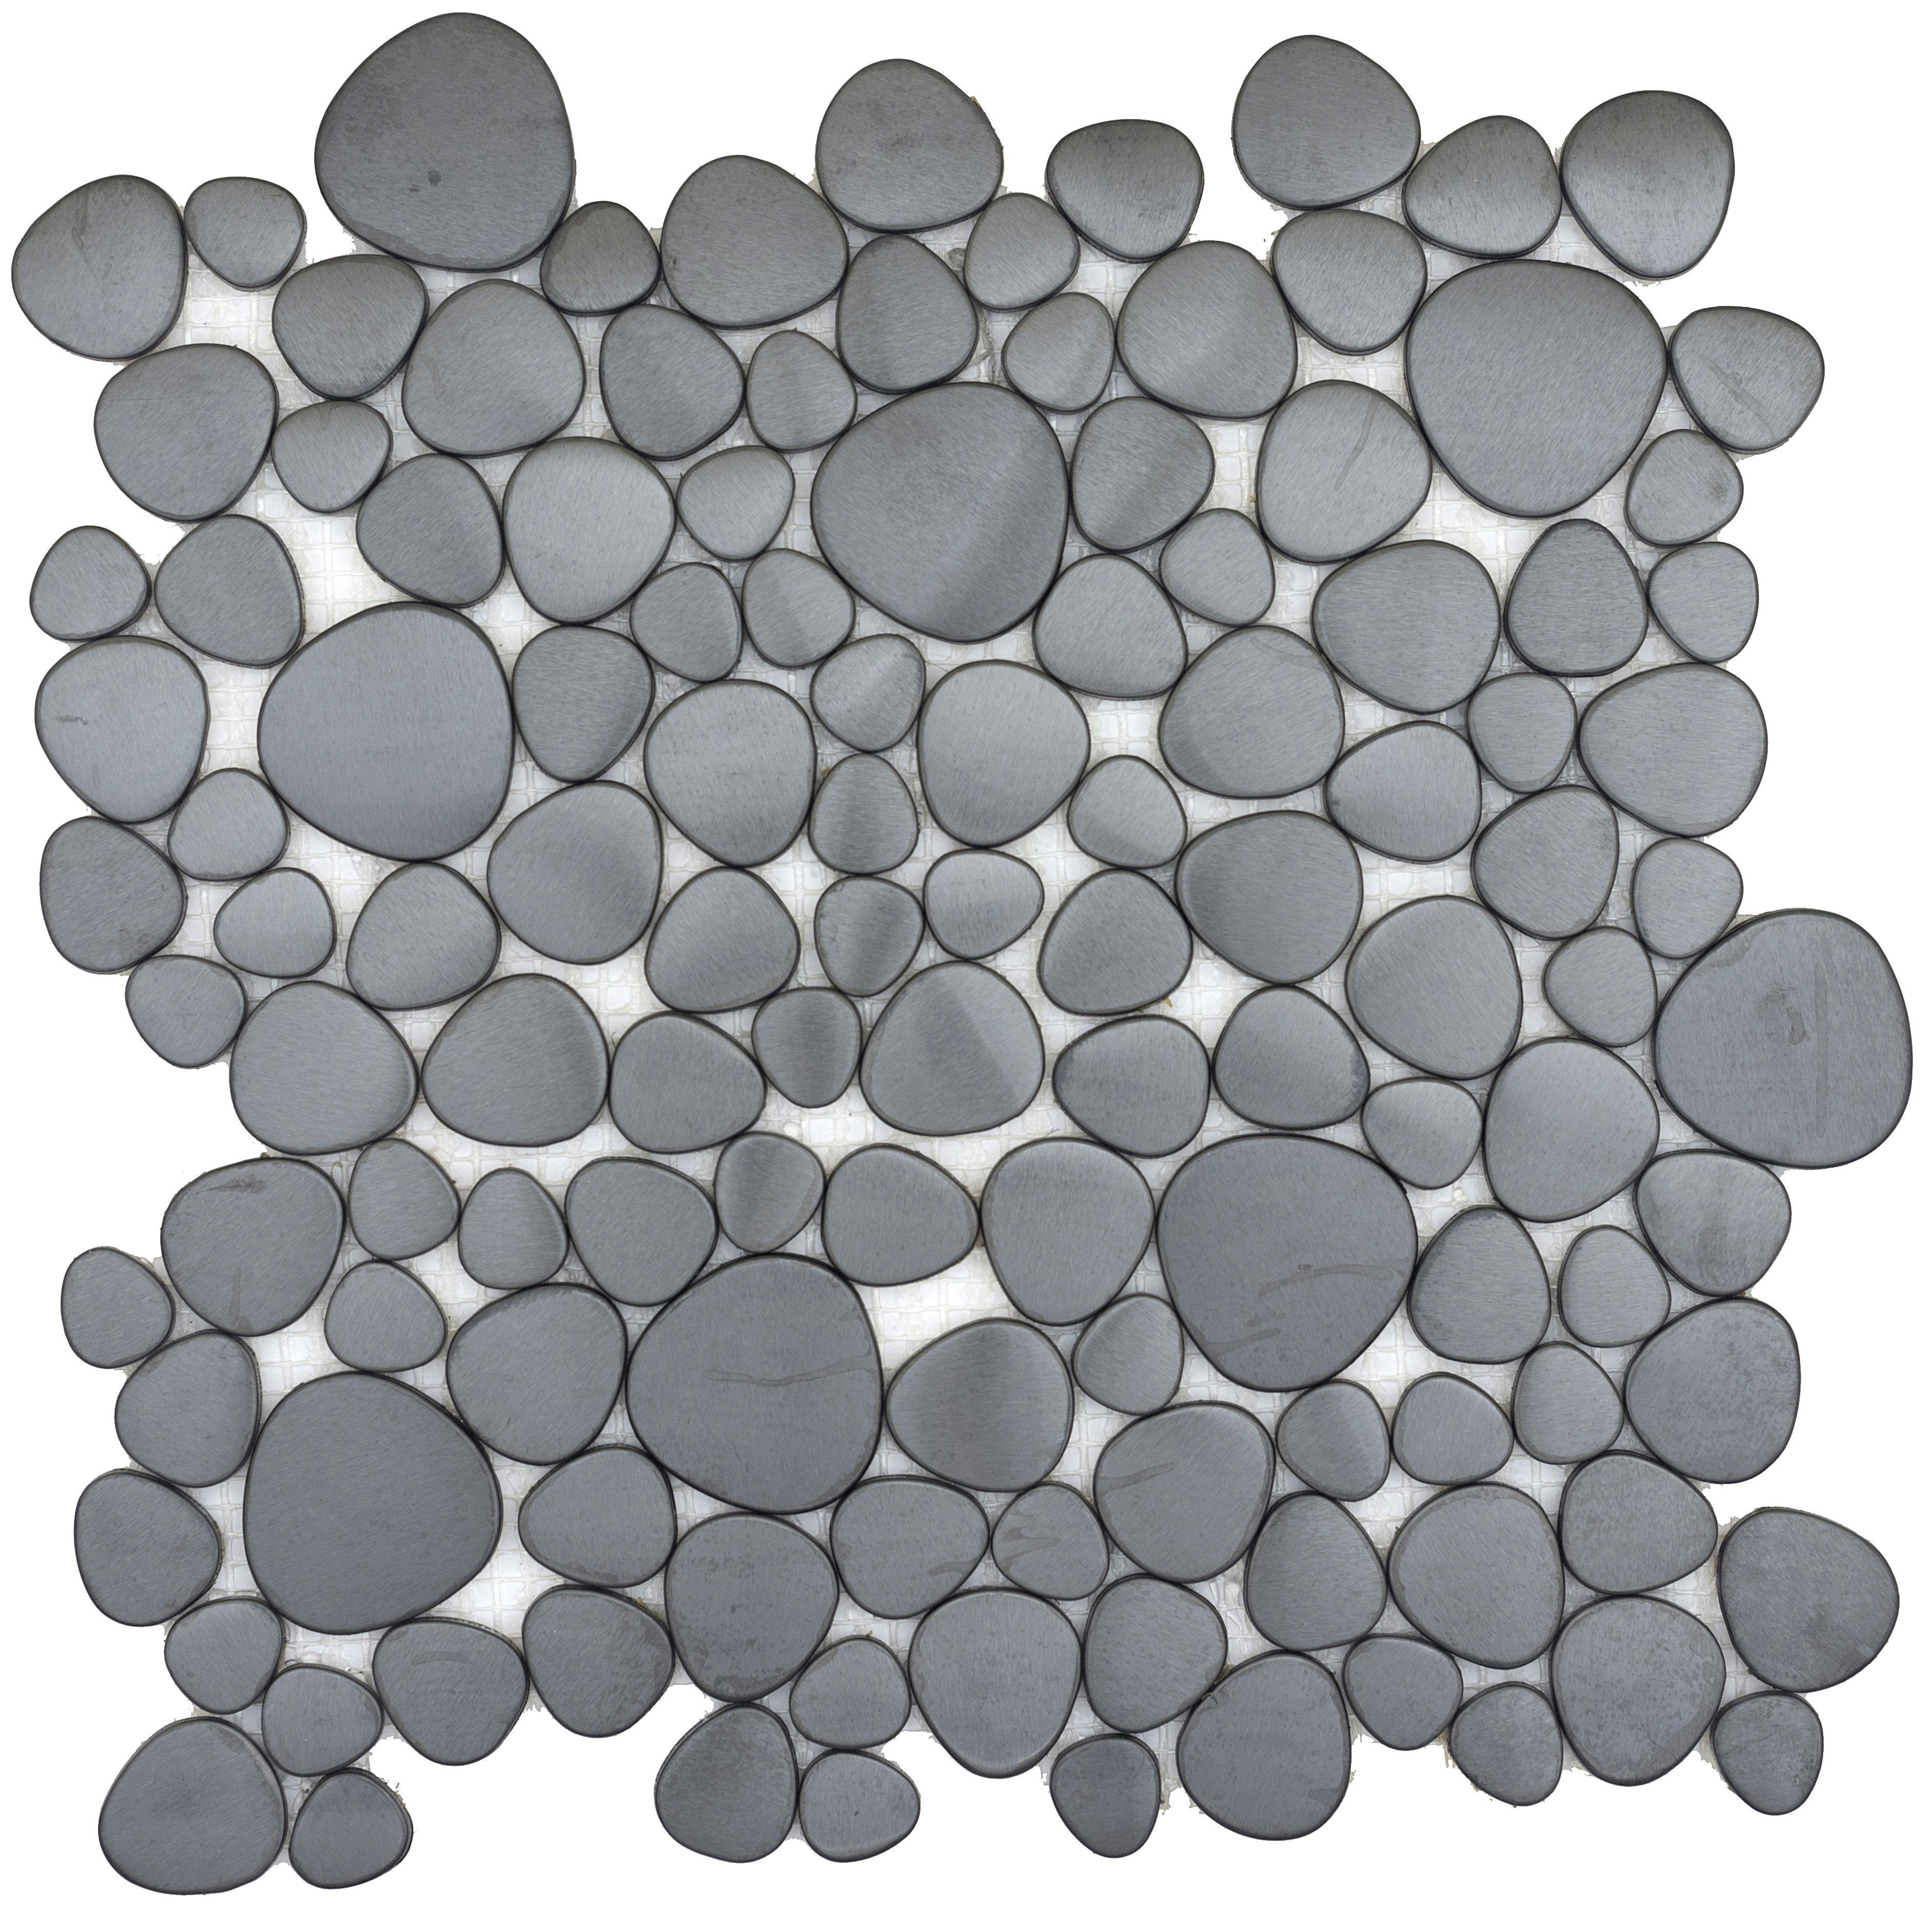 Emser Tile Gleam 12 X 12 Metal Over Ceramic Pebble Mosaic Tile In